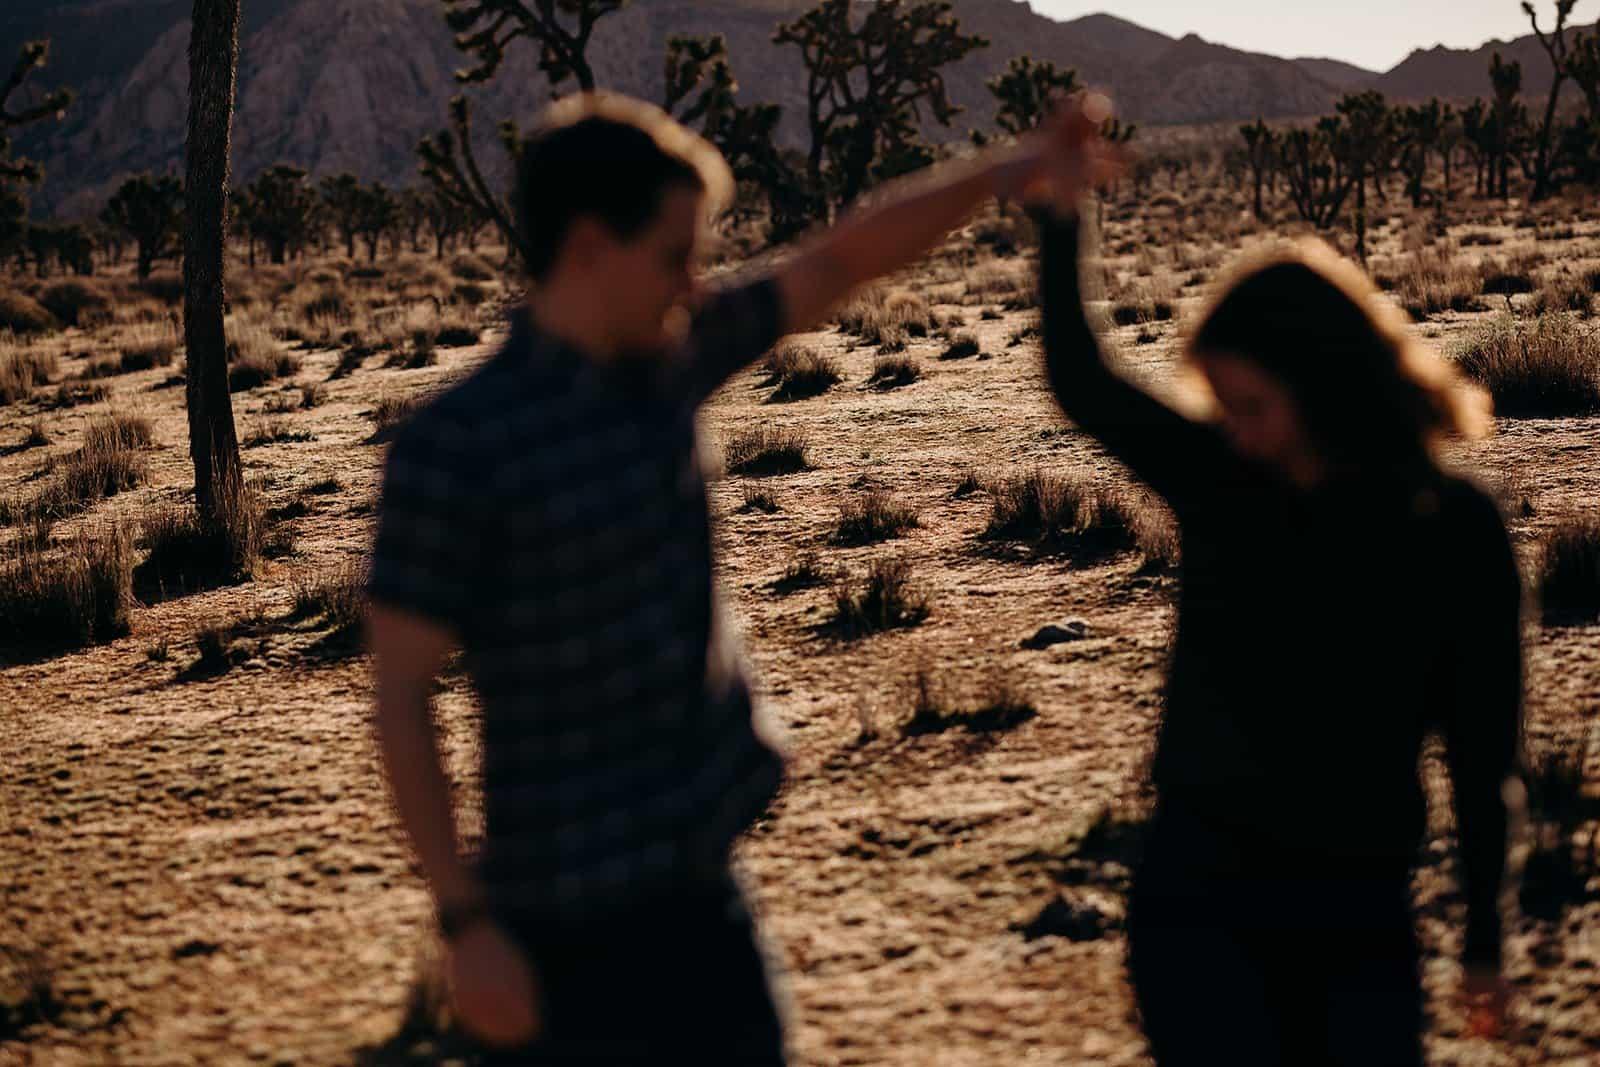 Couple dancing in desert on Joshua Tree Trip